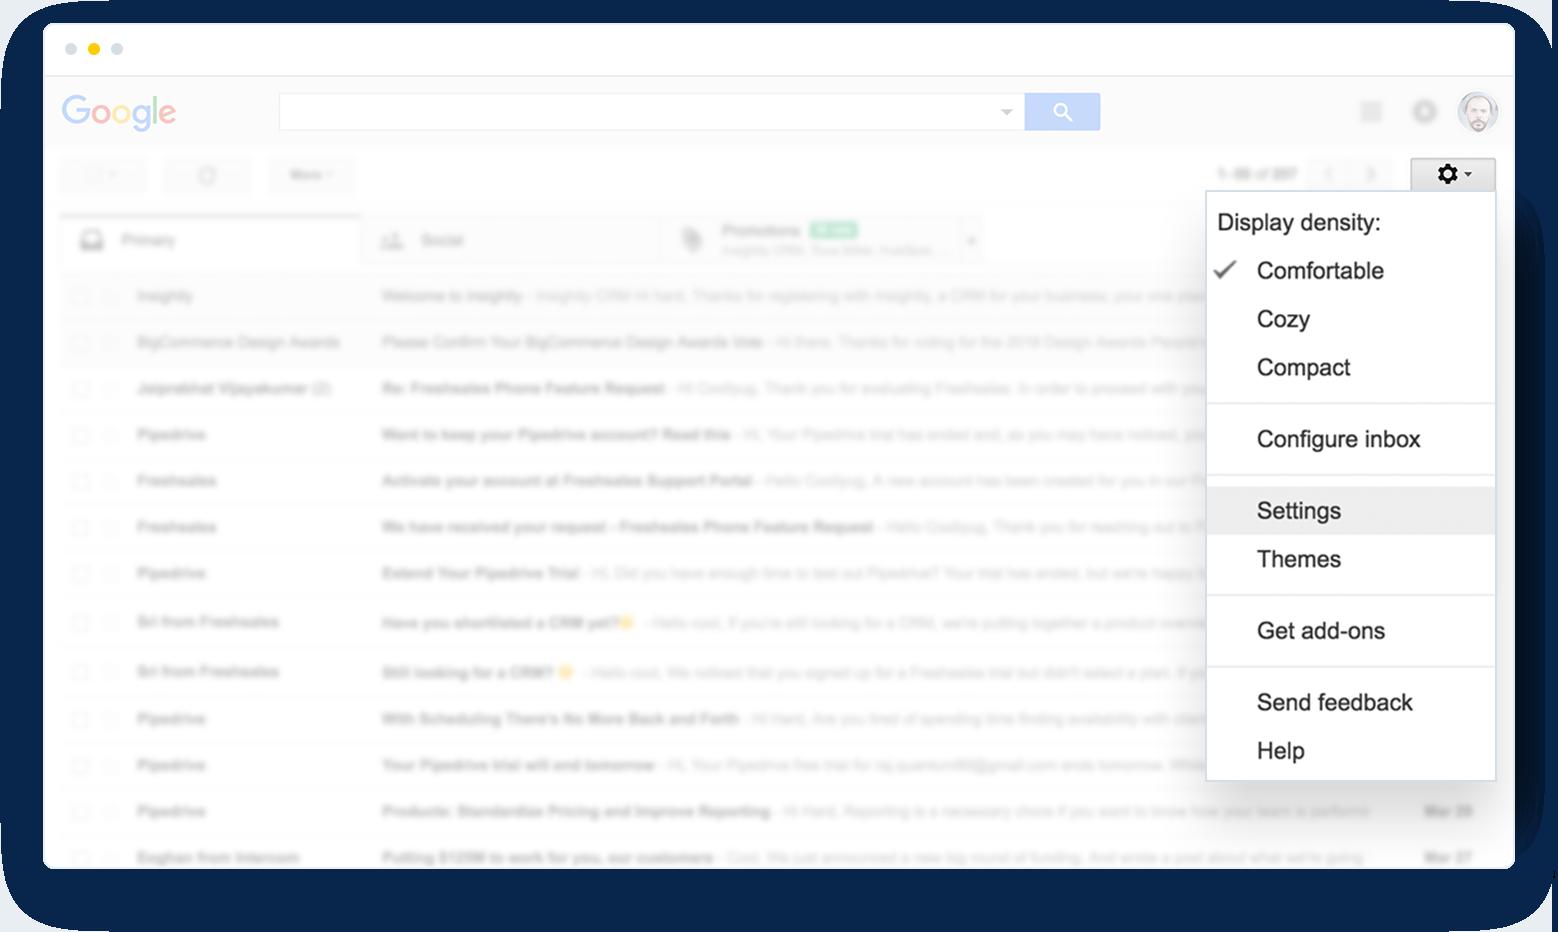 email-setting-image